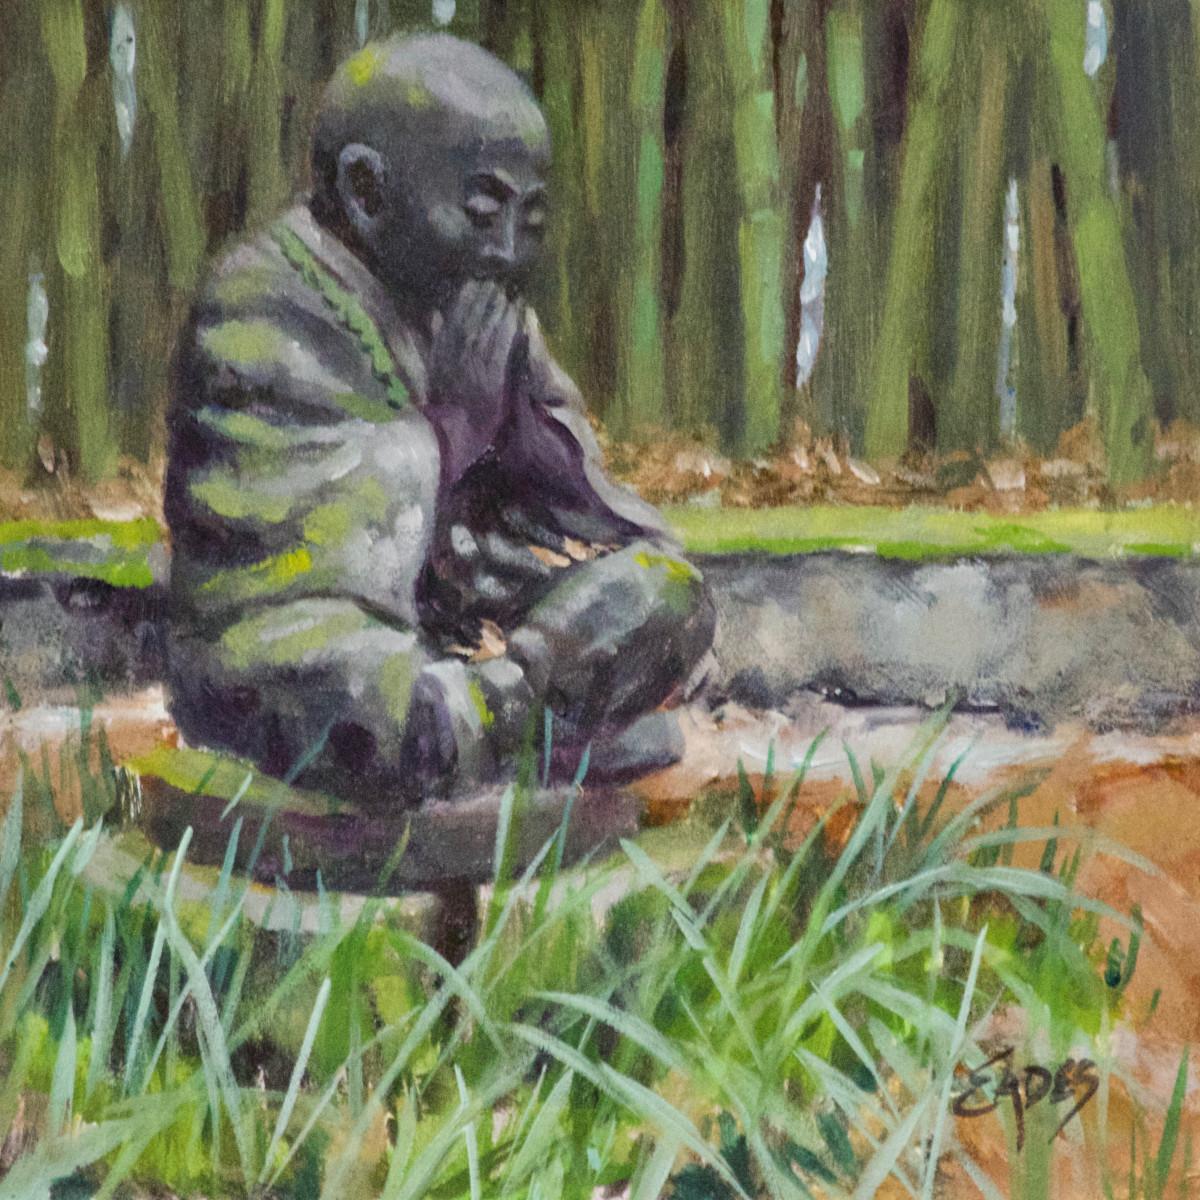 Buddah and Bamboo by Linda Eades Blackburn